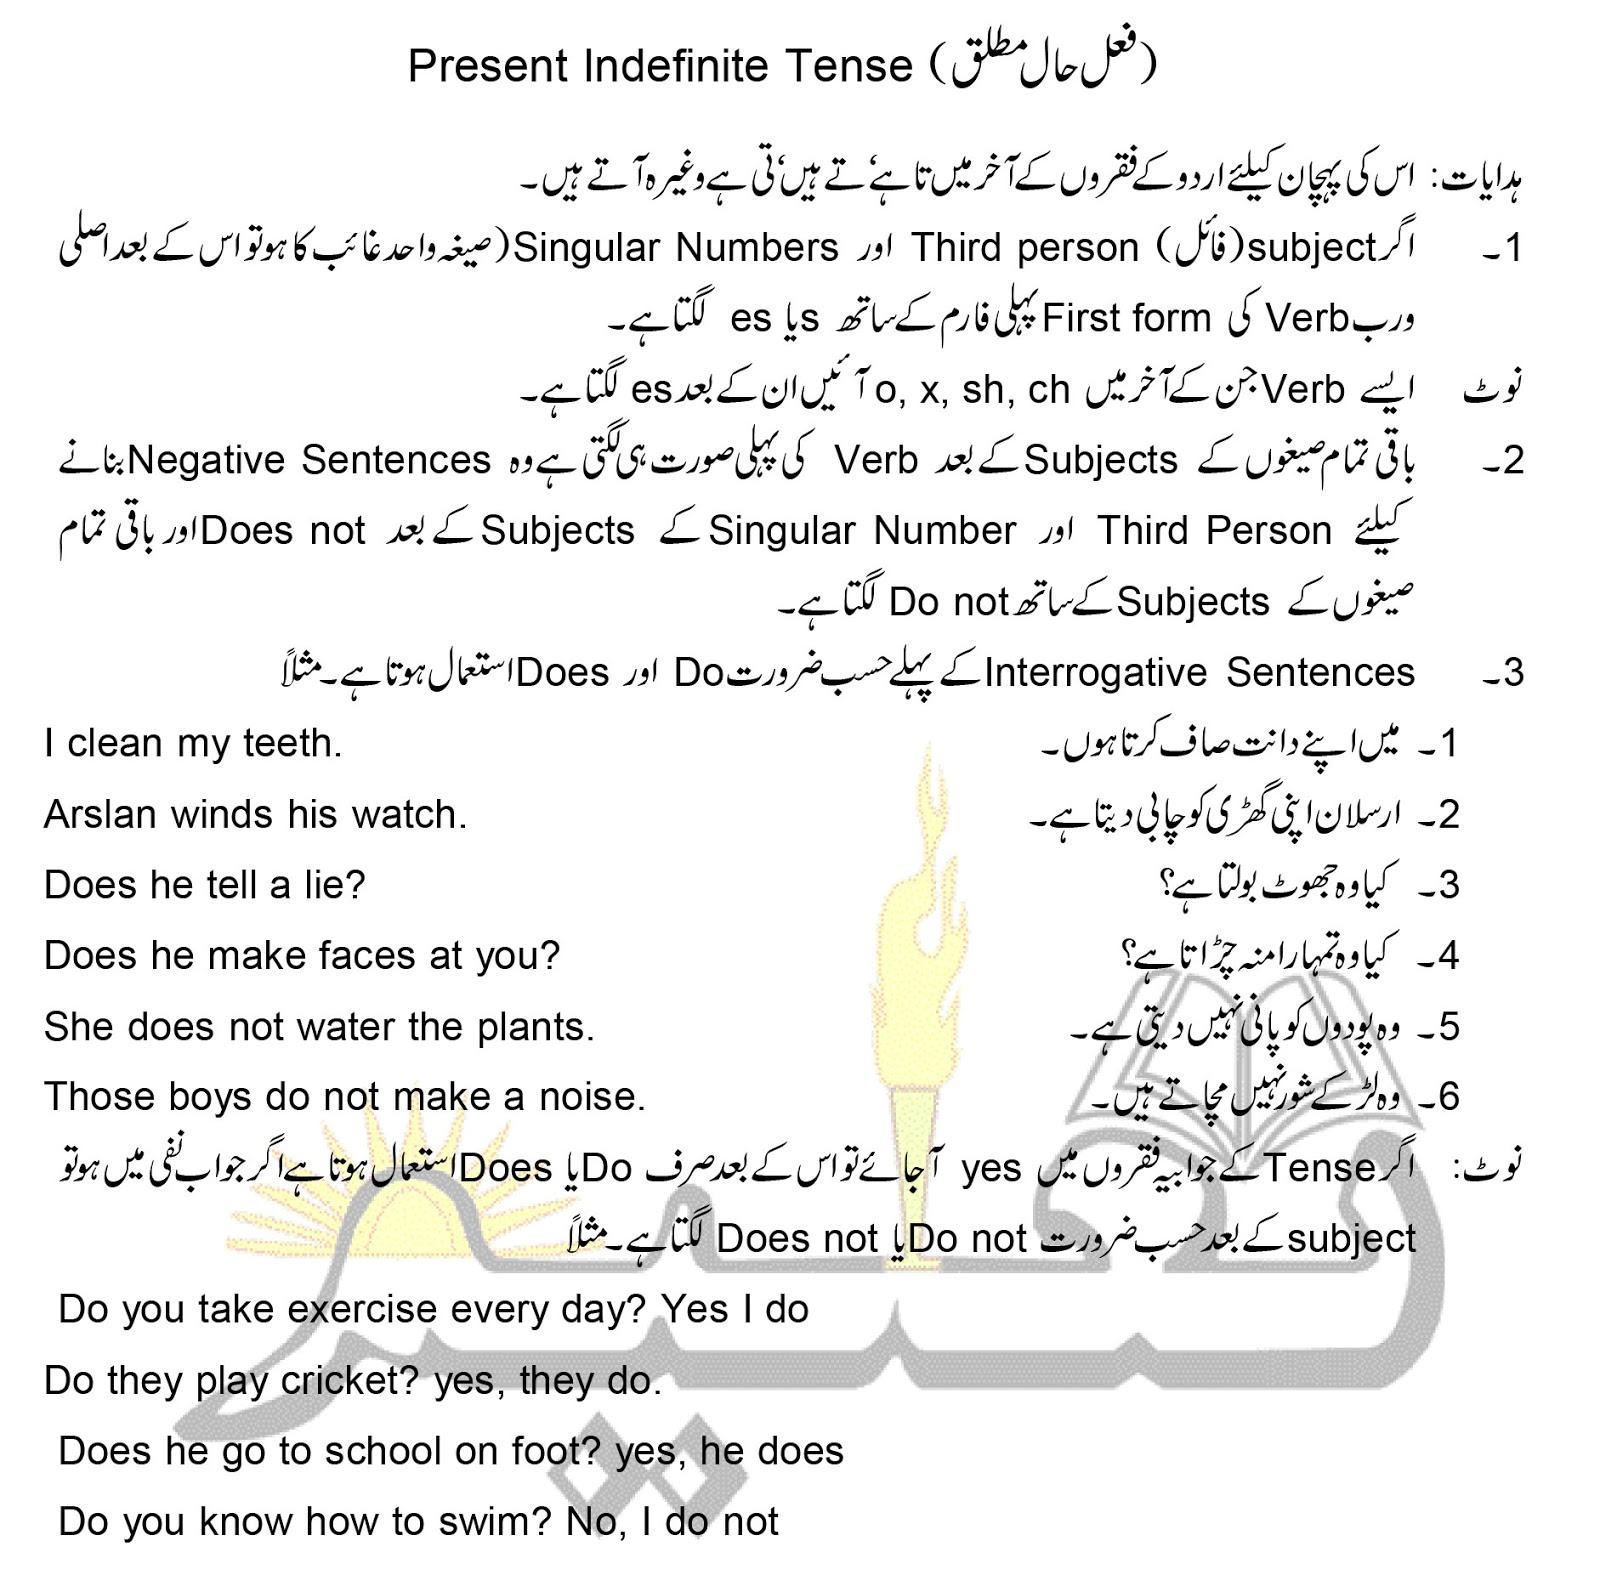 Online Taleem: Present Indefinite Tense